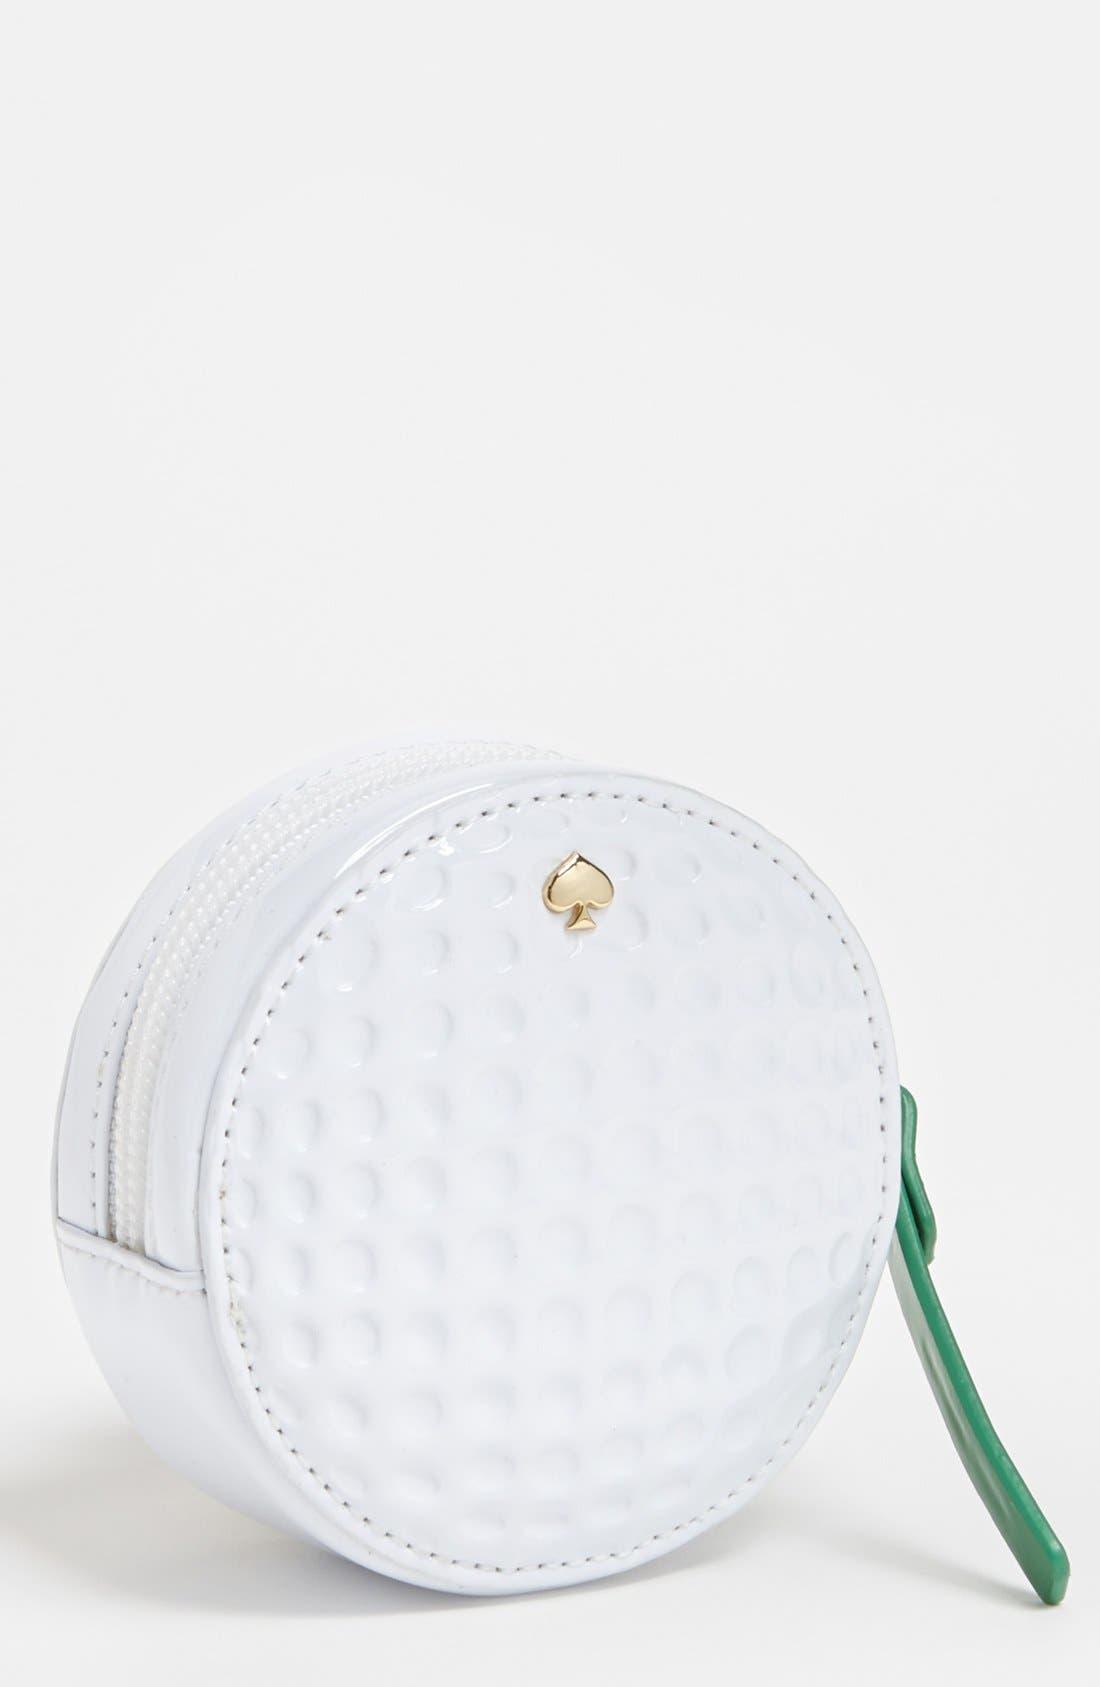 Main Image - kate spade new york 'golf ball' coin purse